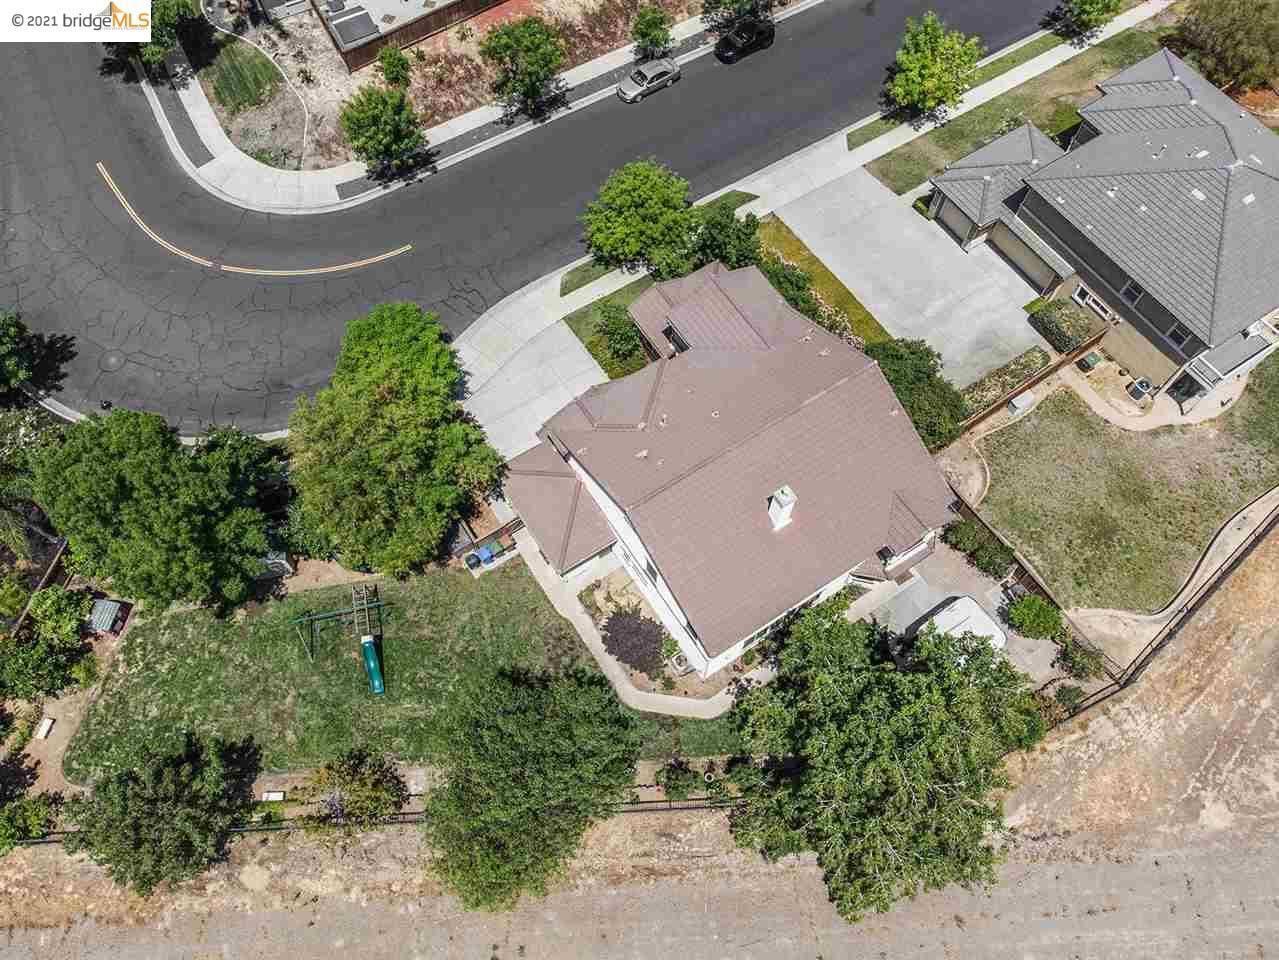 364 Pebble Beach, Brentwood, CA 94513